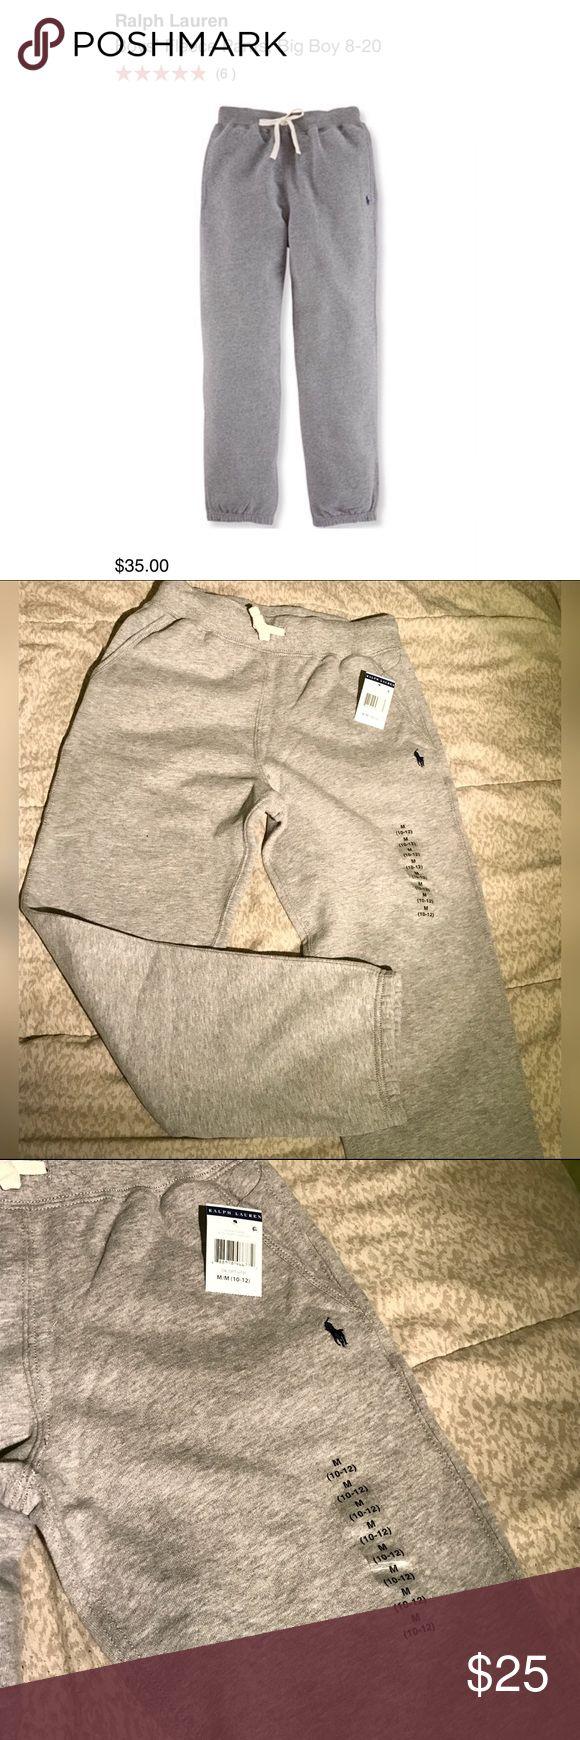 Polo By Ralph Lauren - boys grey sweatpants BNWT grey Polo sweatpants - Boys size M (10-12) Polo by Ralph Lauren Bottoms Sweatpants & Joggers